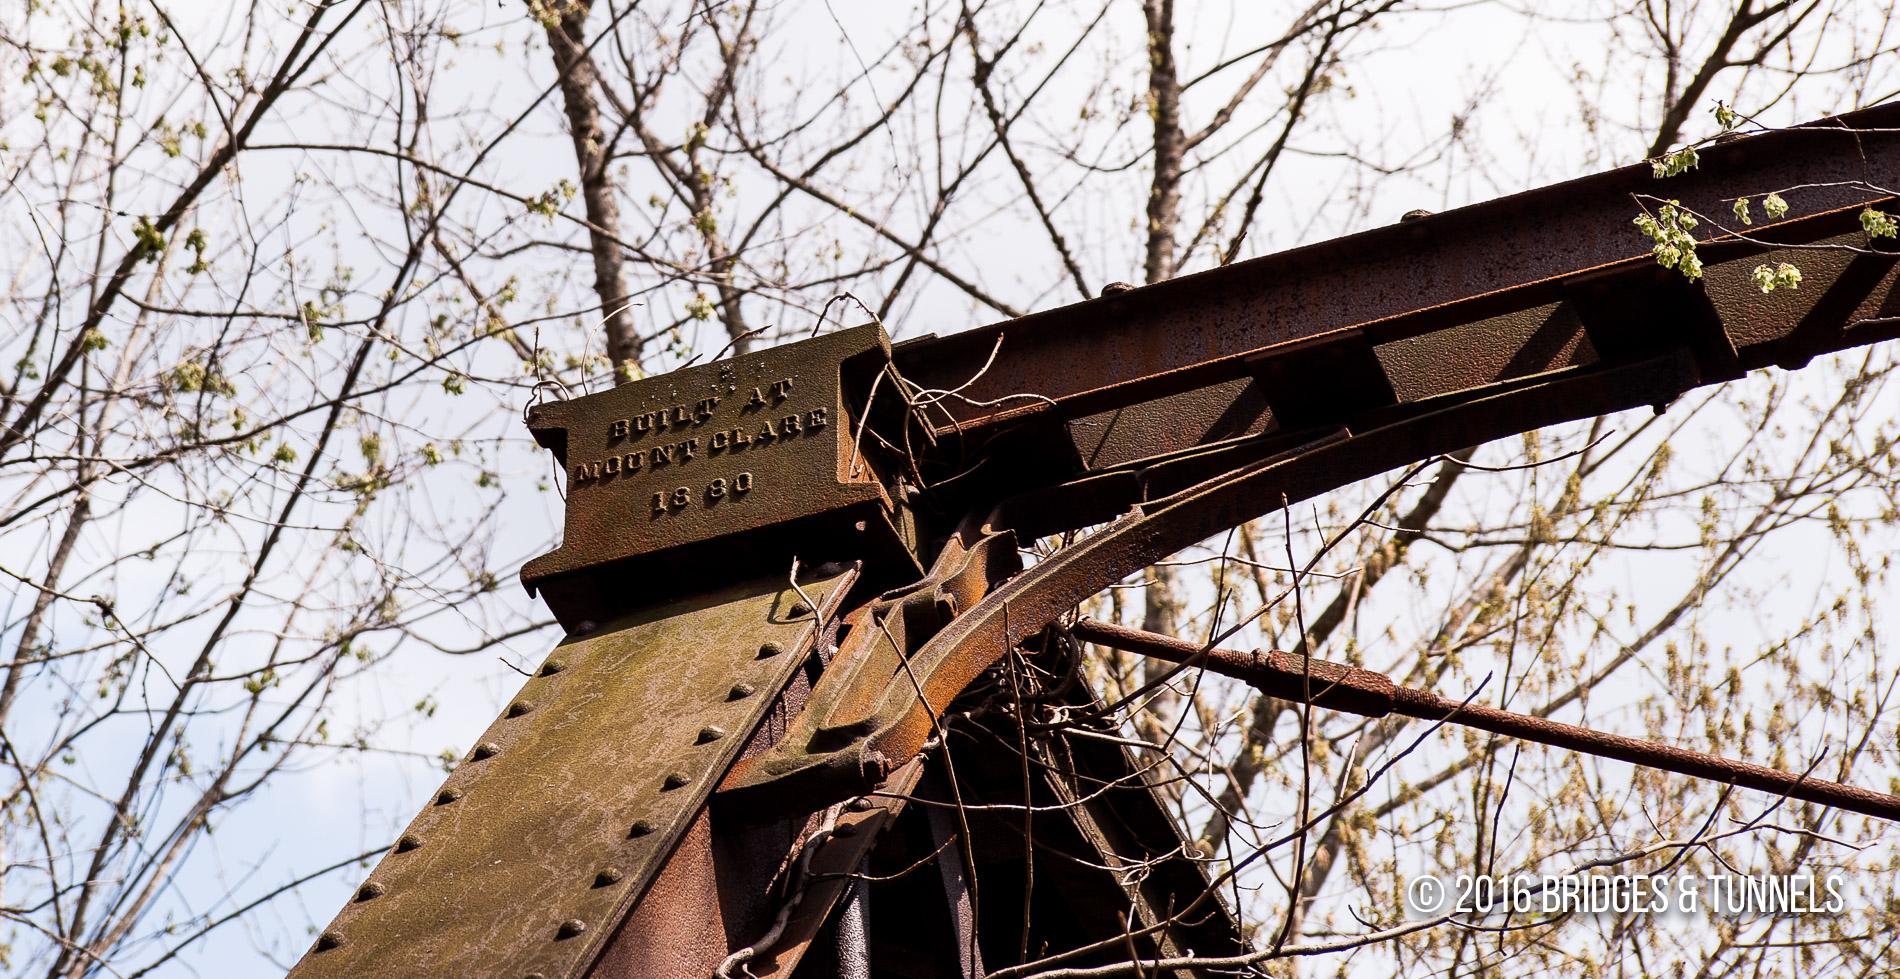 Johns Run Eastern Kentucky Railway Bridge